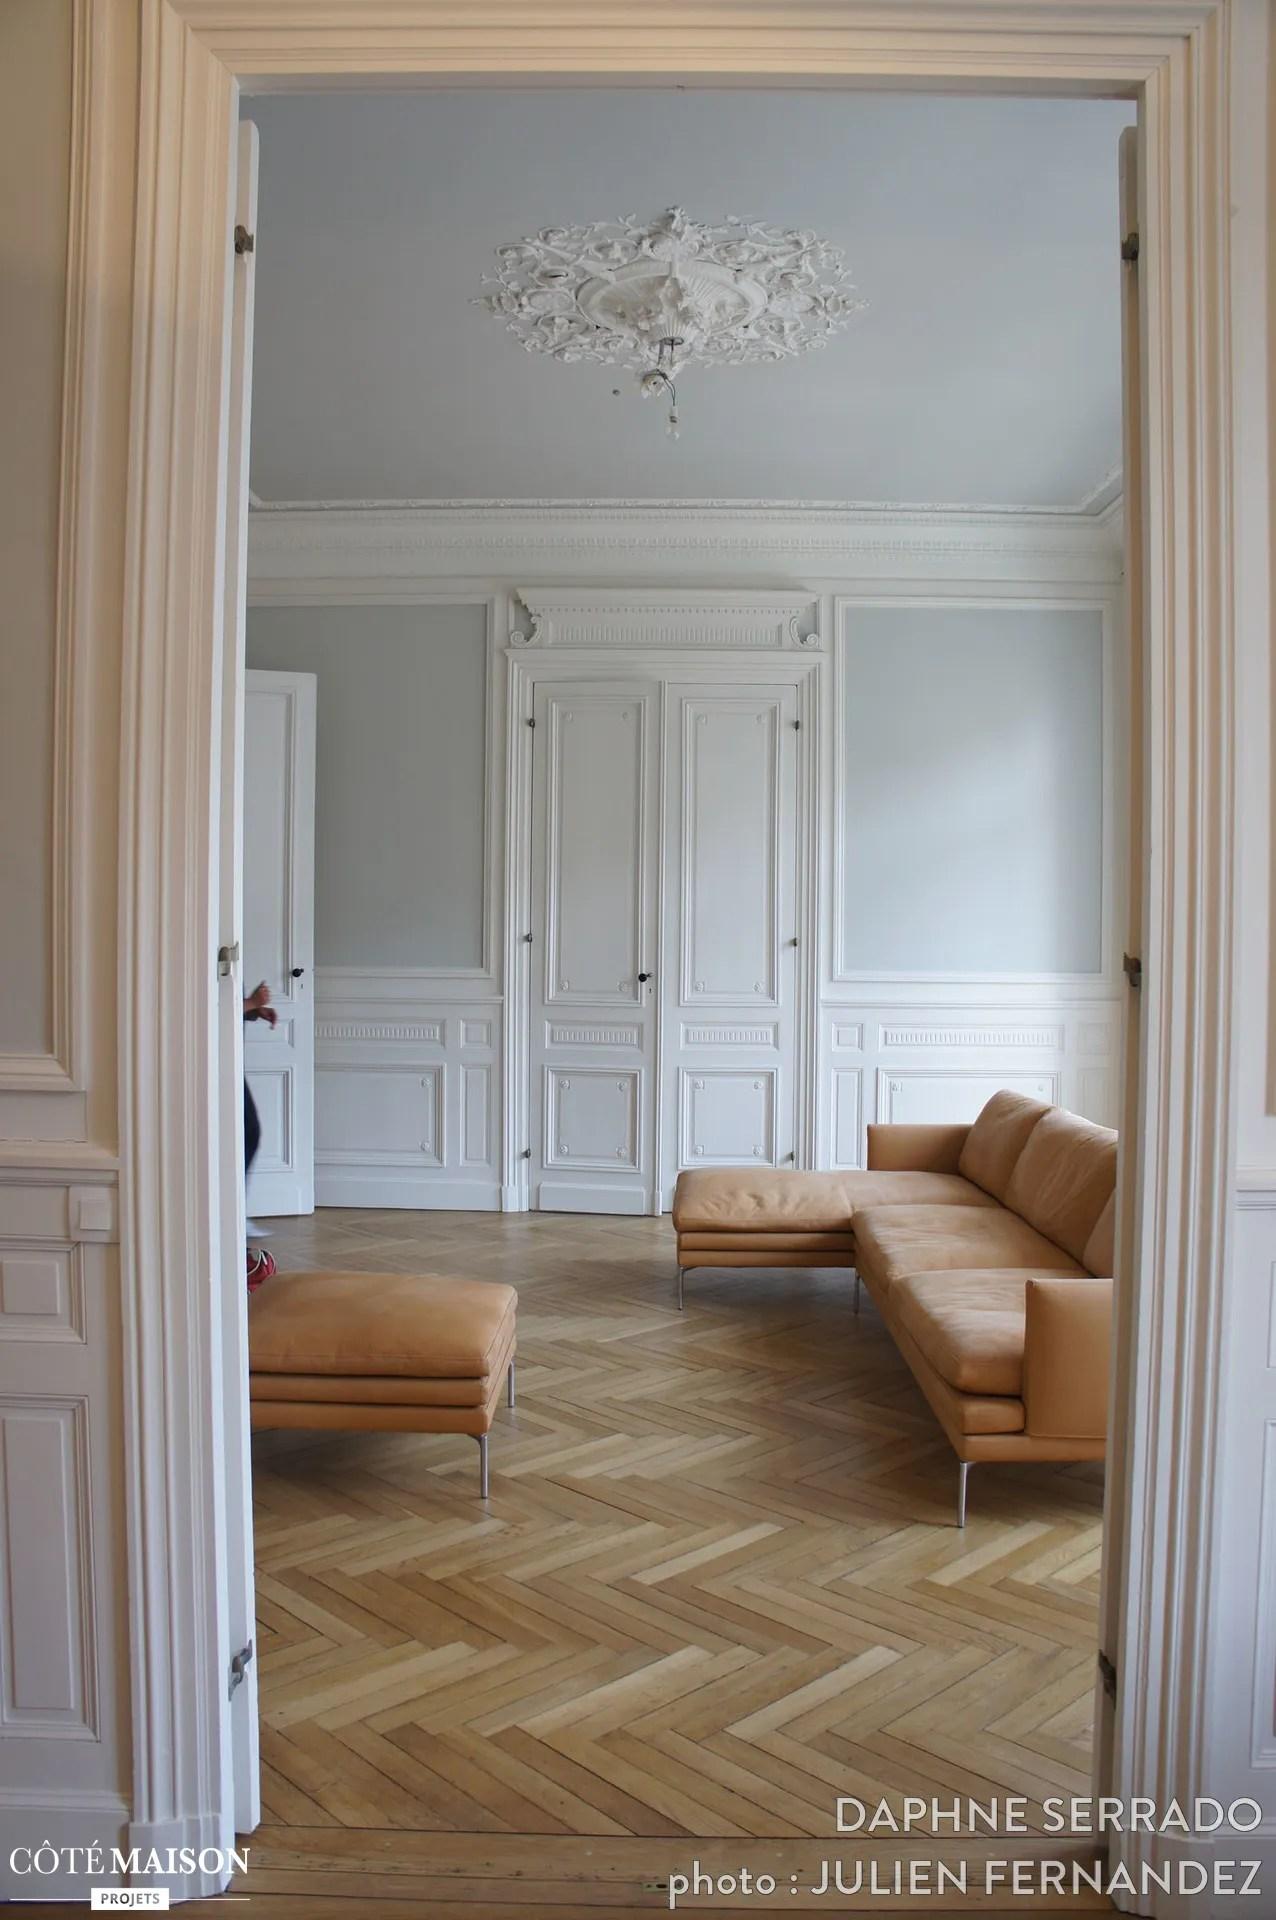 Appartement De Type Haussmannien Daphn Serrado Ct Maison